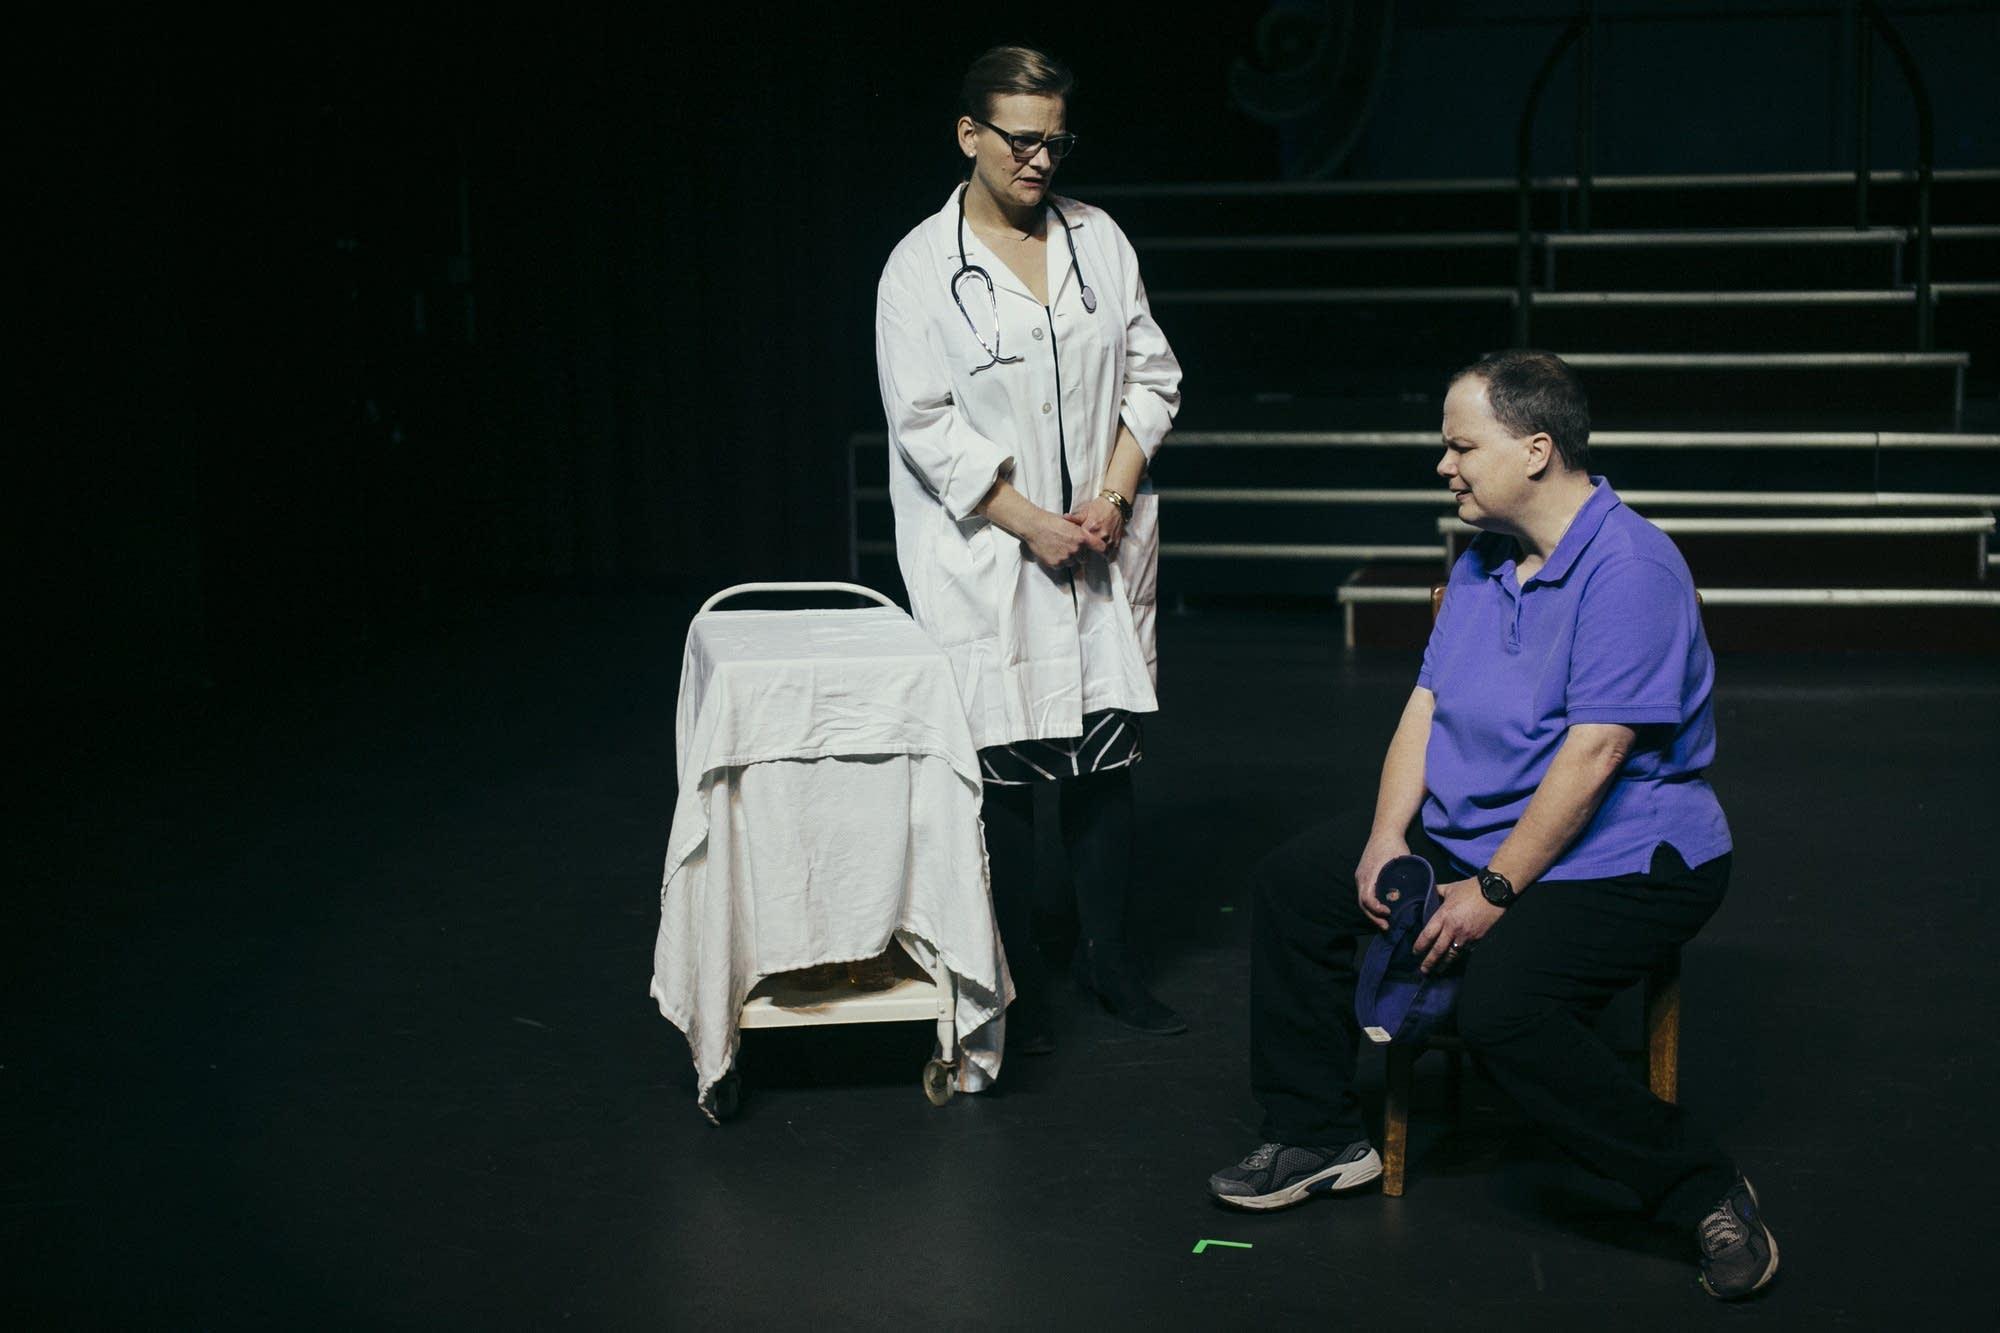 TJ Carley and Mykel Pennington rehearse a scene